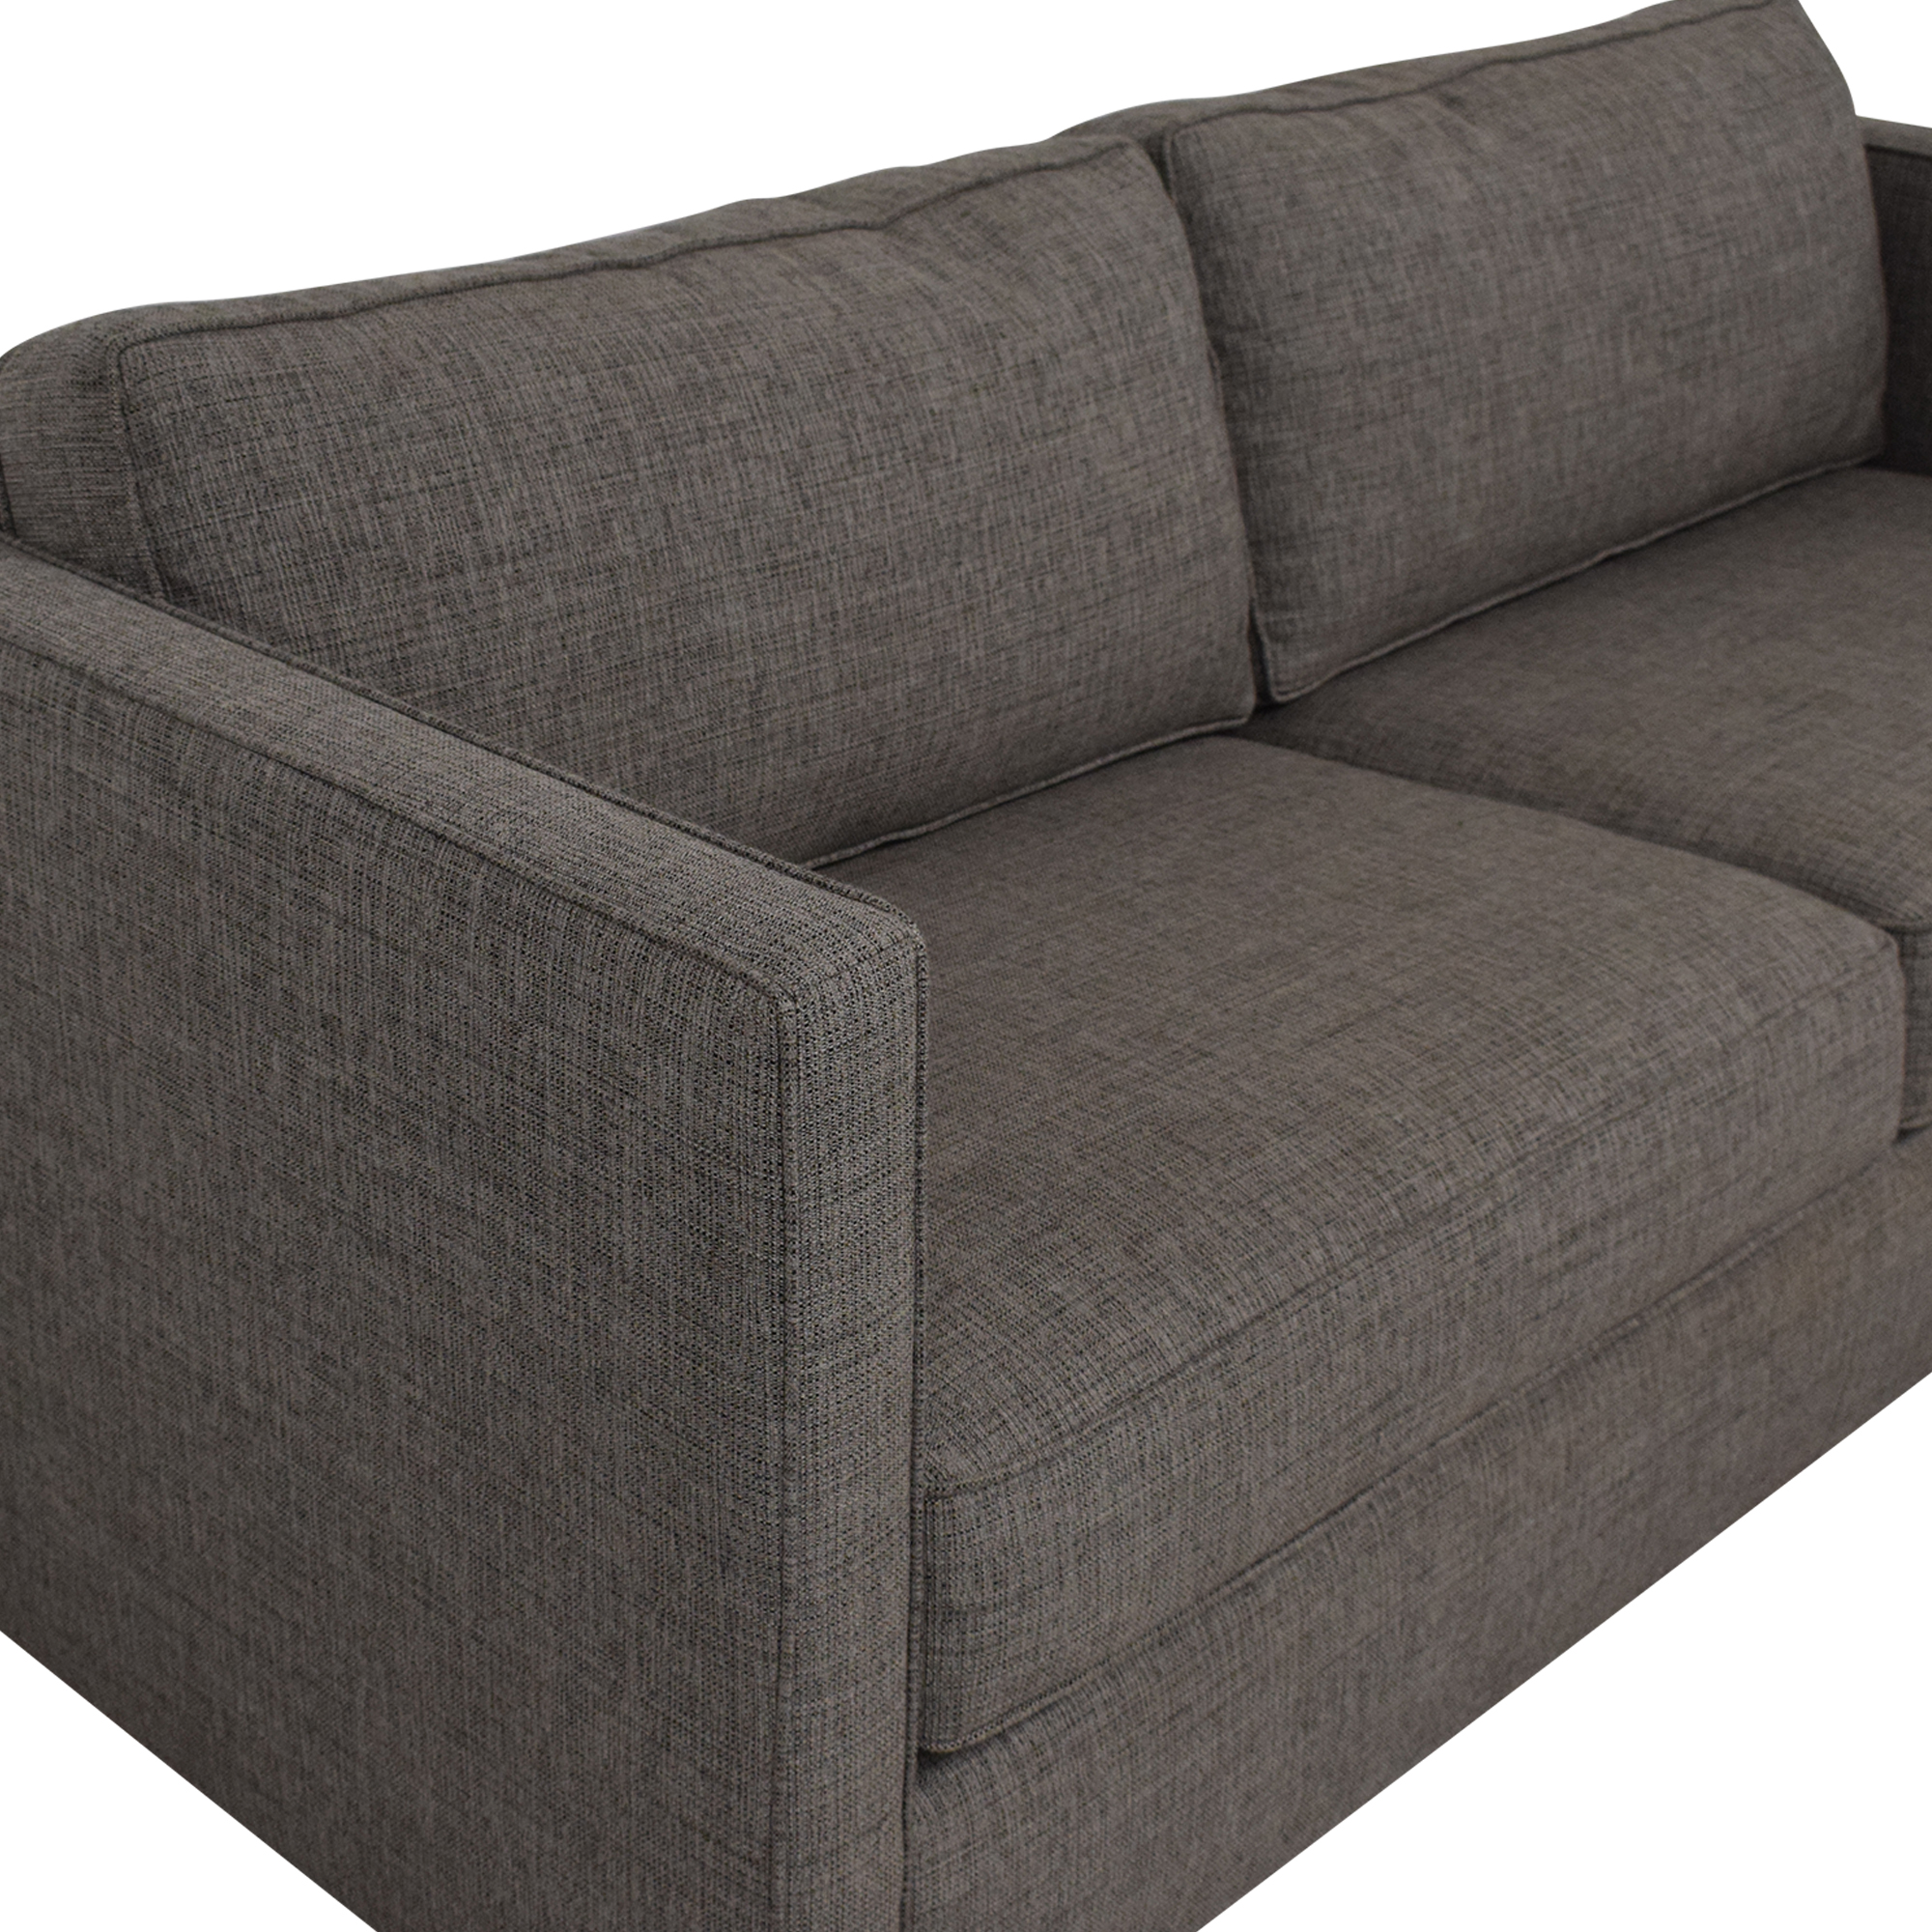 buy Room & Board Room & Board Watson Guest Select Sleeper Sofa online